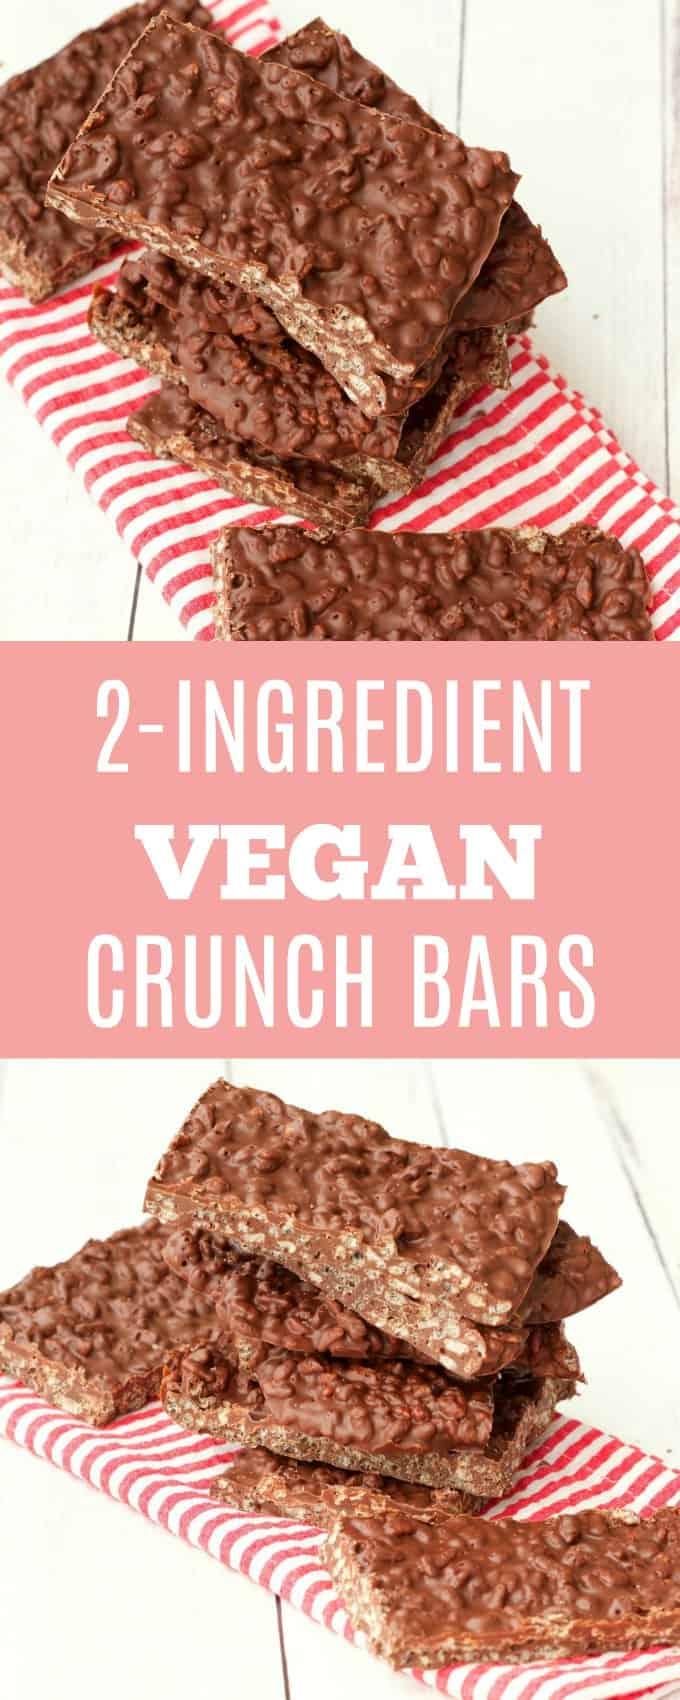 Simple vegan chocolate crunch bars. Just 2-ingredients and 15 minutes and you have the most delicious treat. Vegan and Gluten-Free. Vegan   Vegan Chocolate   Vegan Desserts   lovingitvegan.com